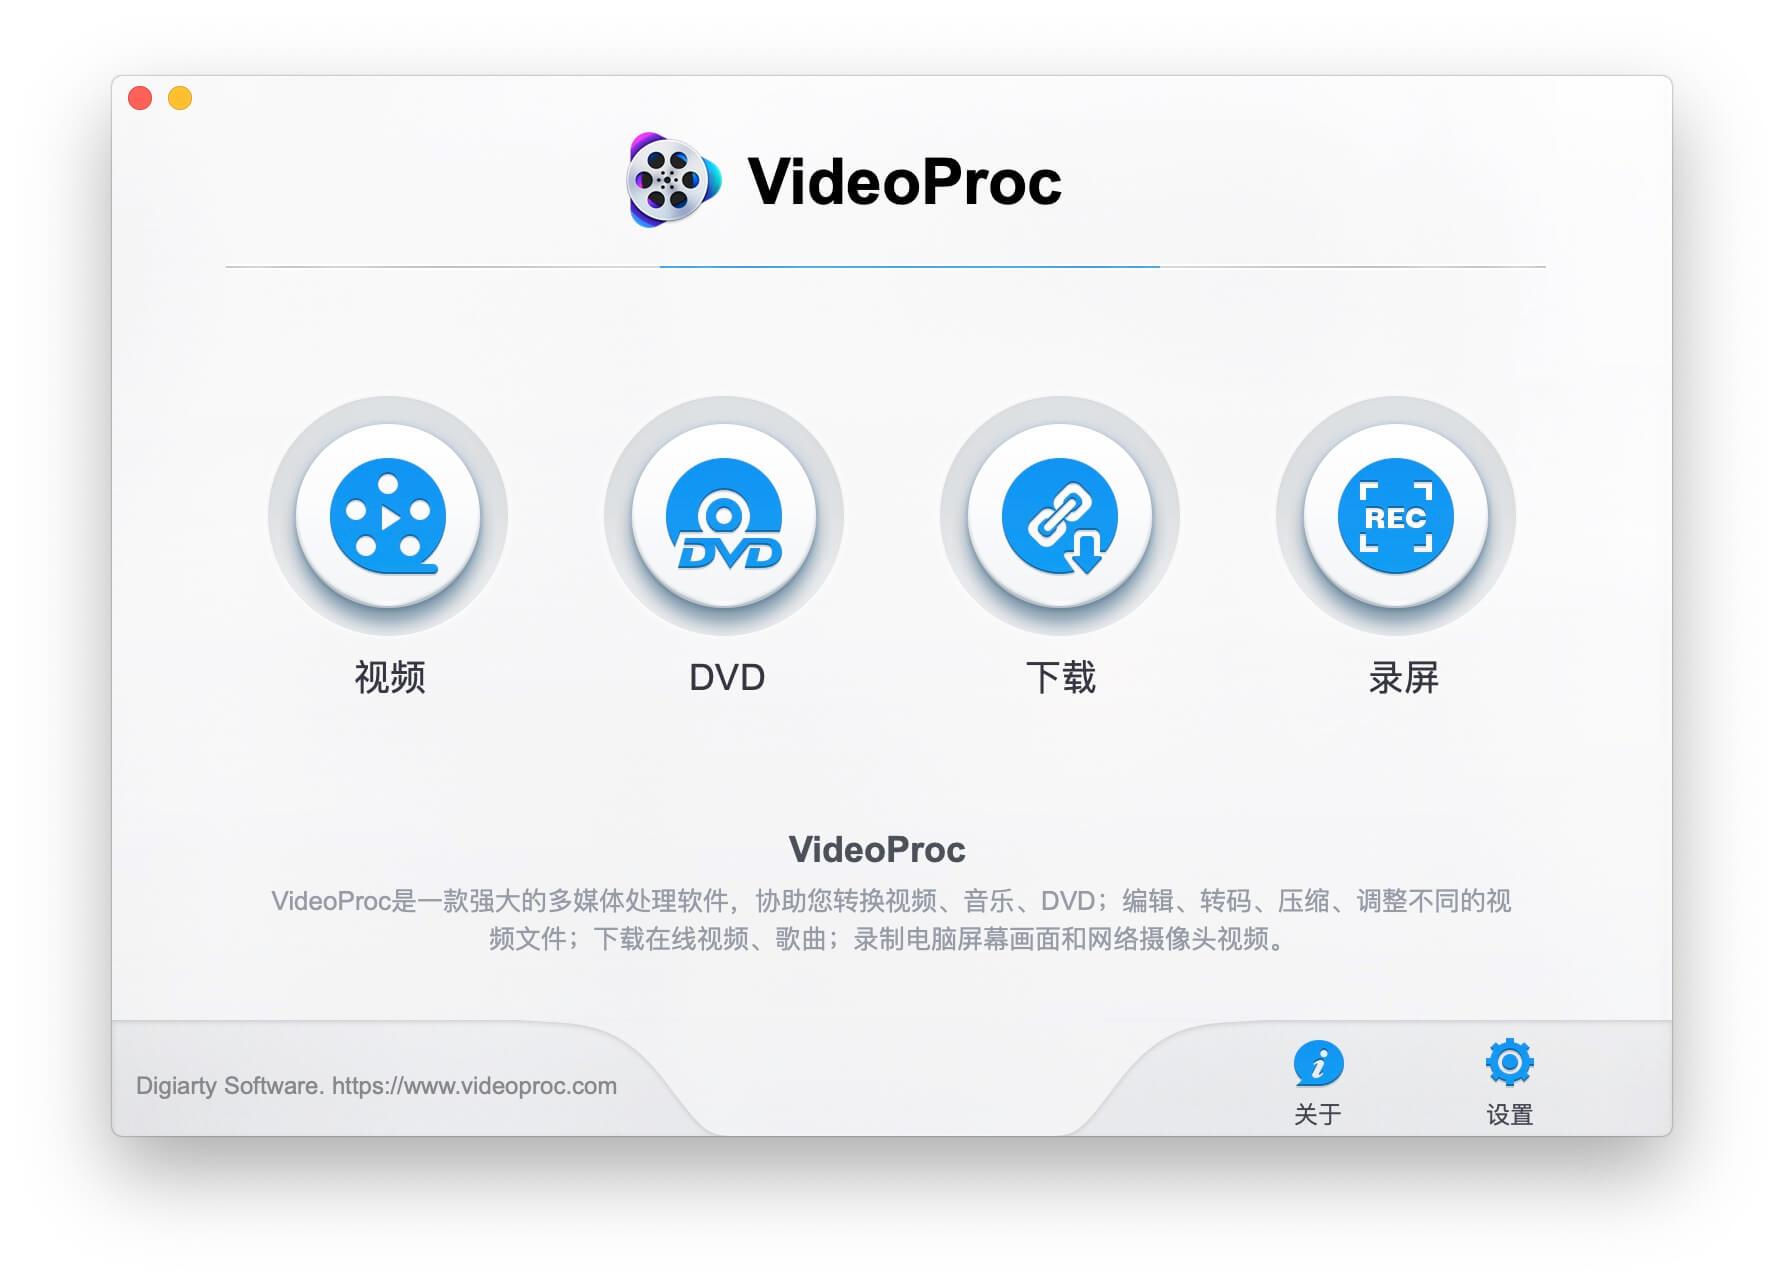 VideoProc 3.5 (20200120) 集视频音频格式转换下载录屏一身支持Catalina